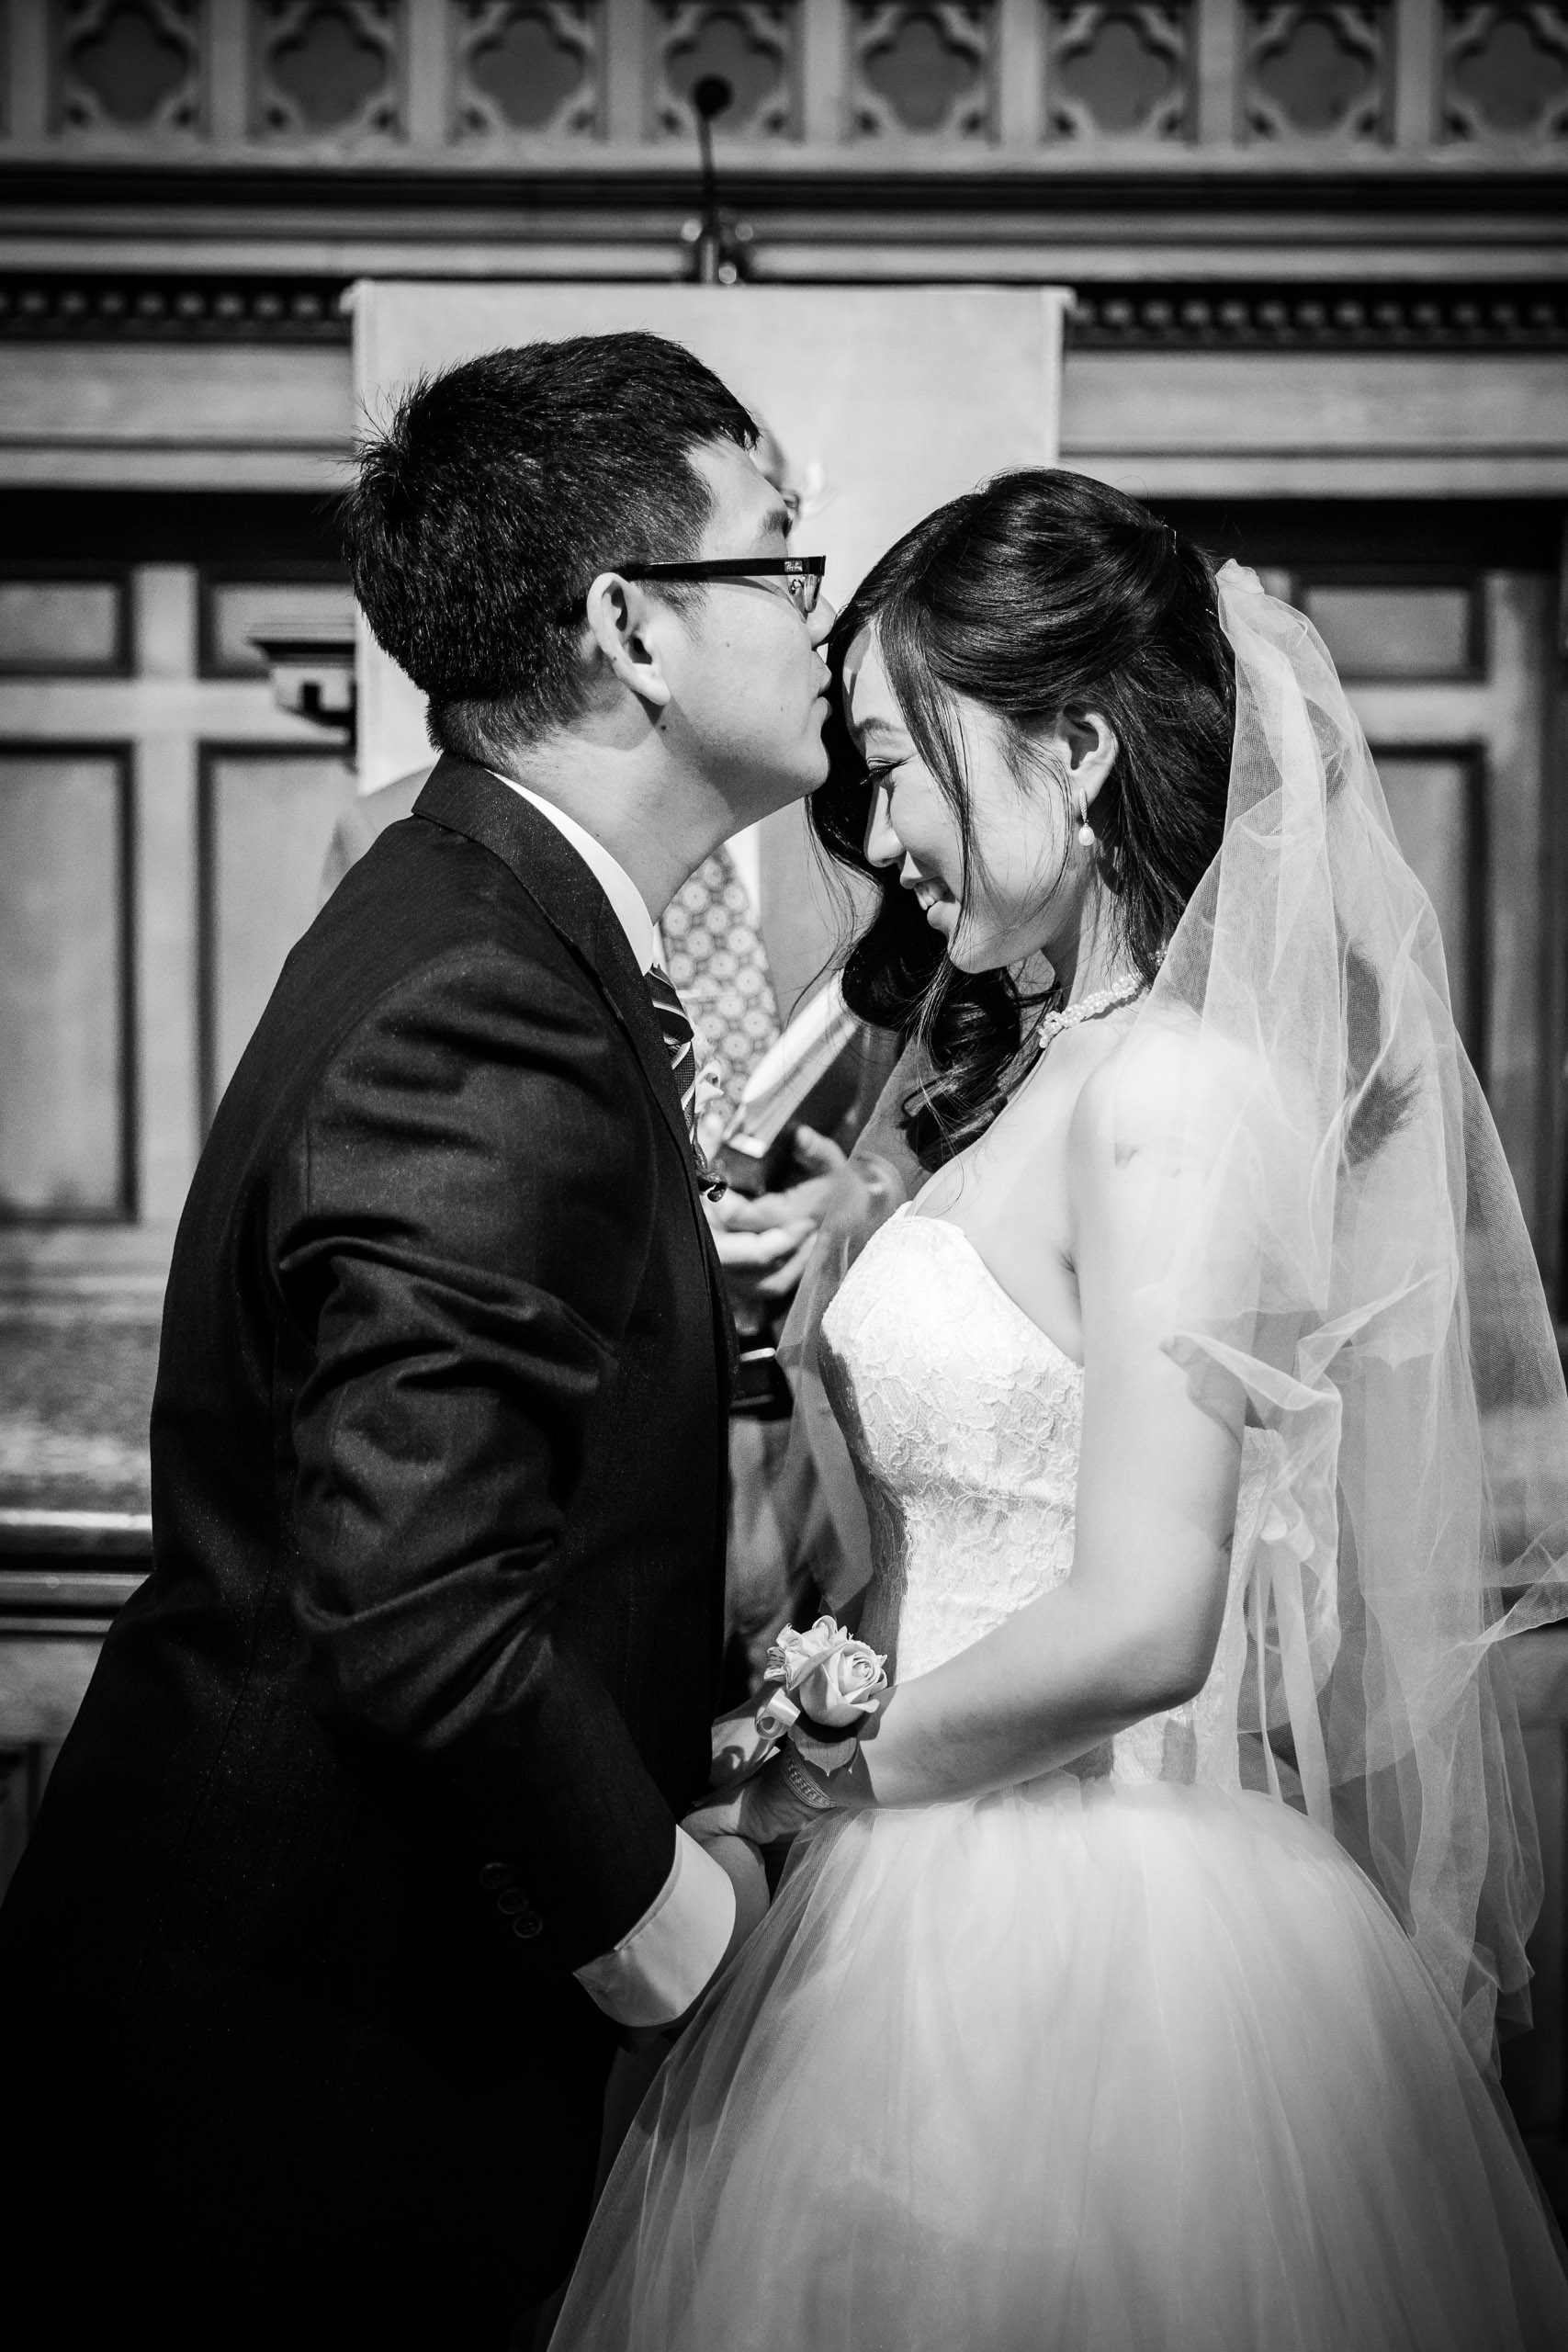 Wedding-wbw-00006